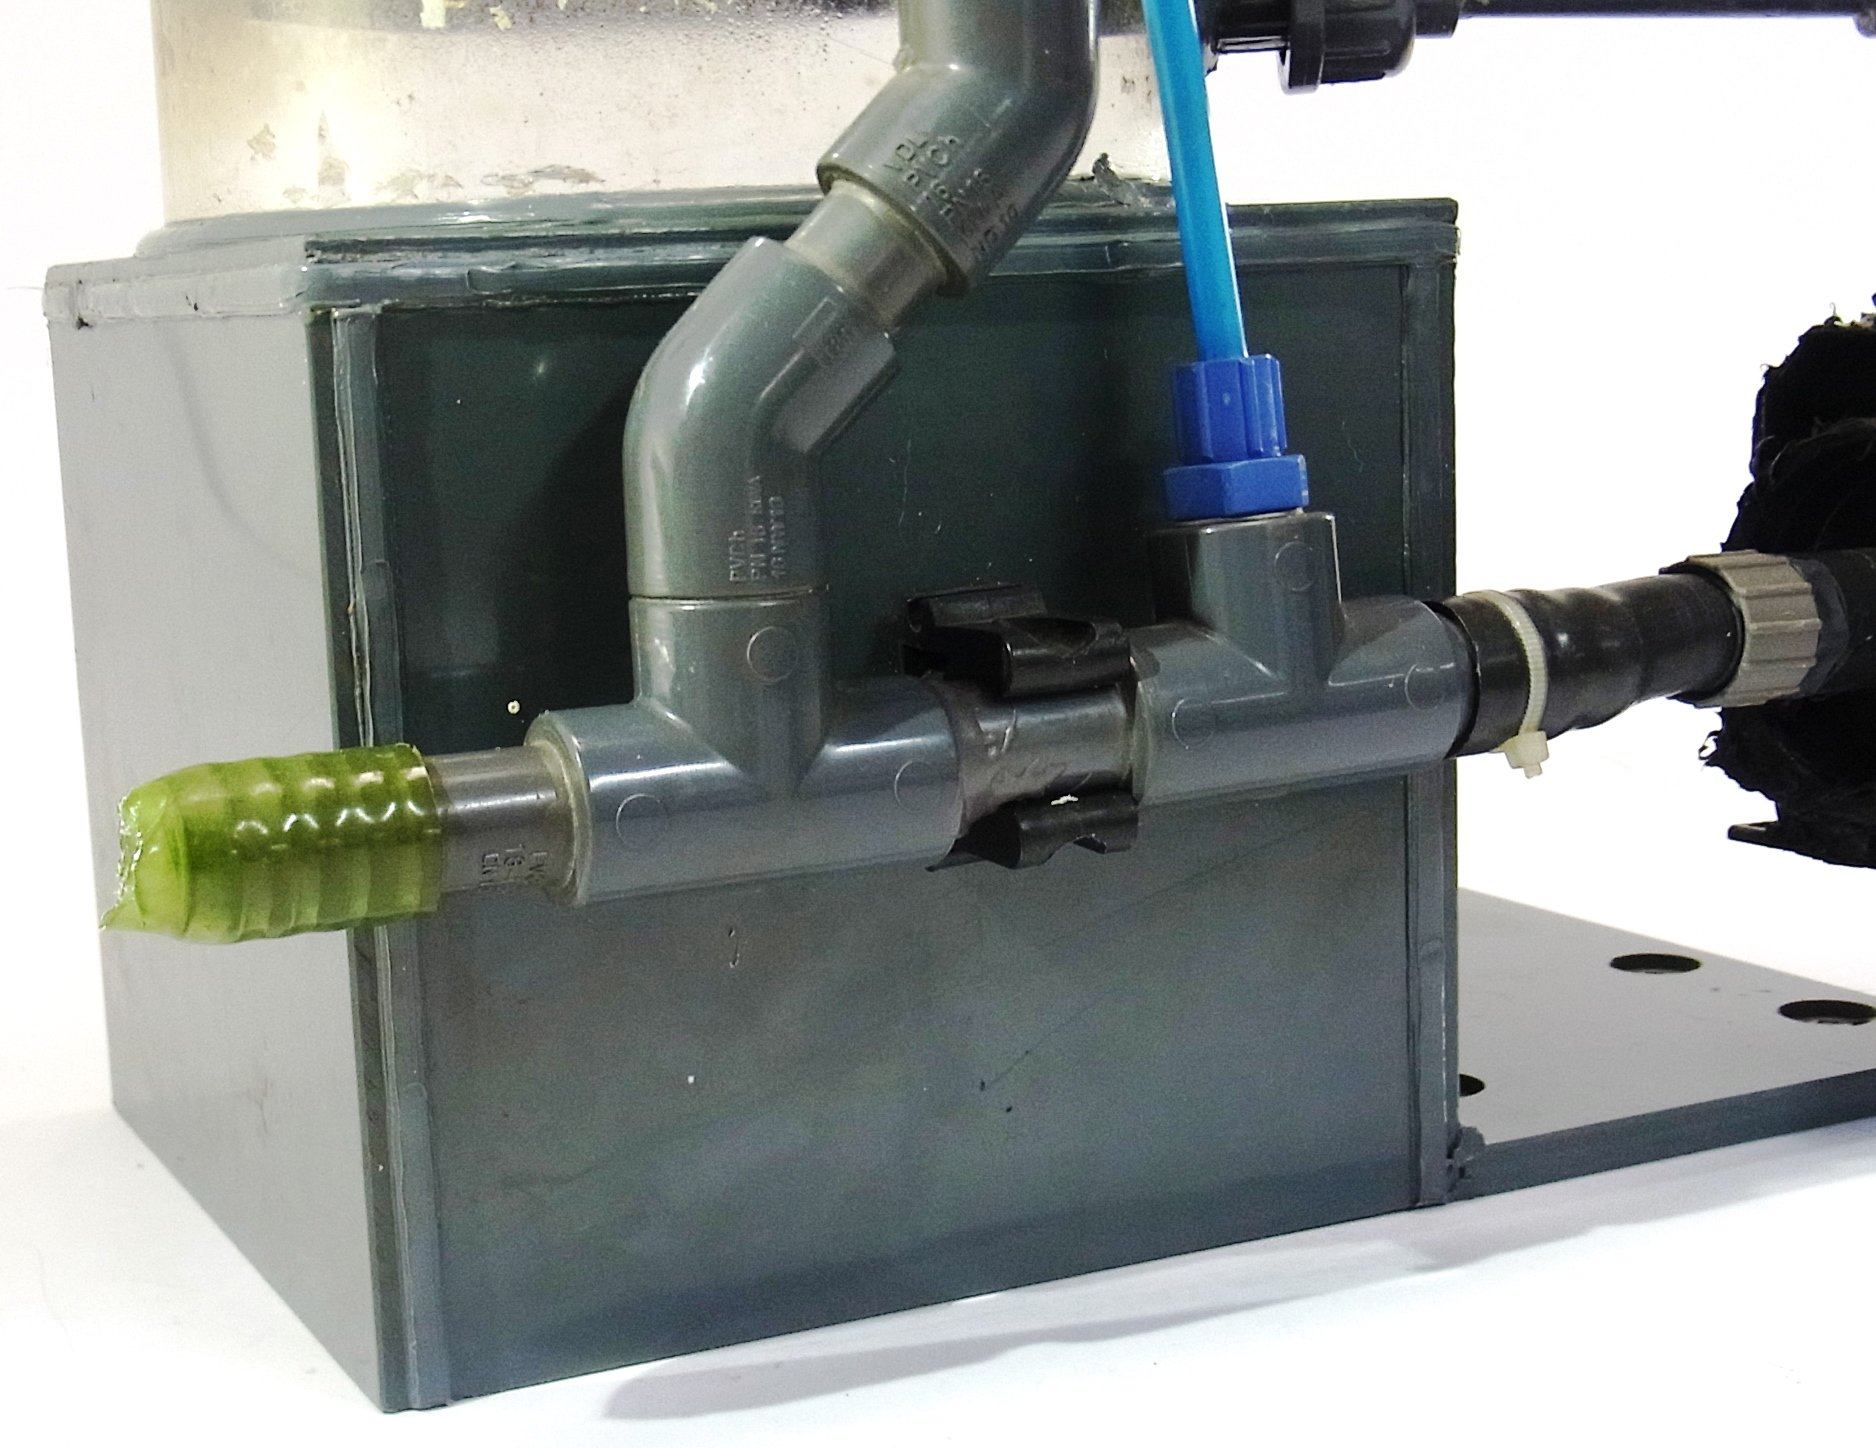 h s kalkreaktor 150 f2000ia mit eheim pumpe aufh rtfilter aquarium meerwasser ebay. Black Bedroom Furniture Sets. Home Design Ideas